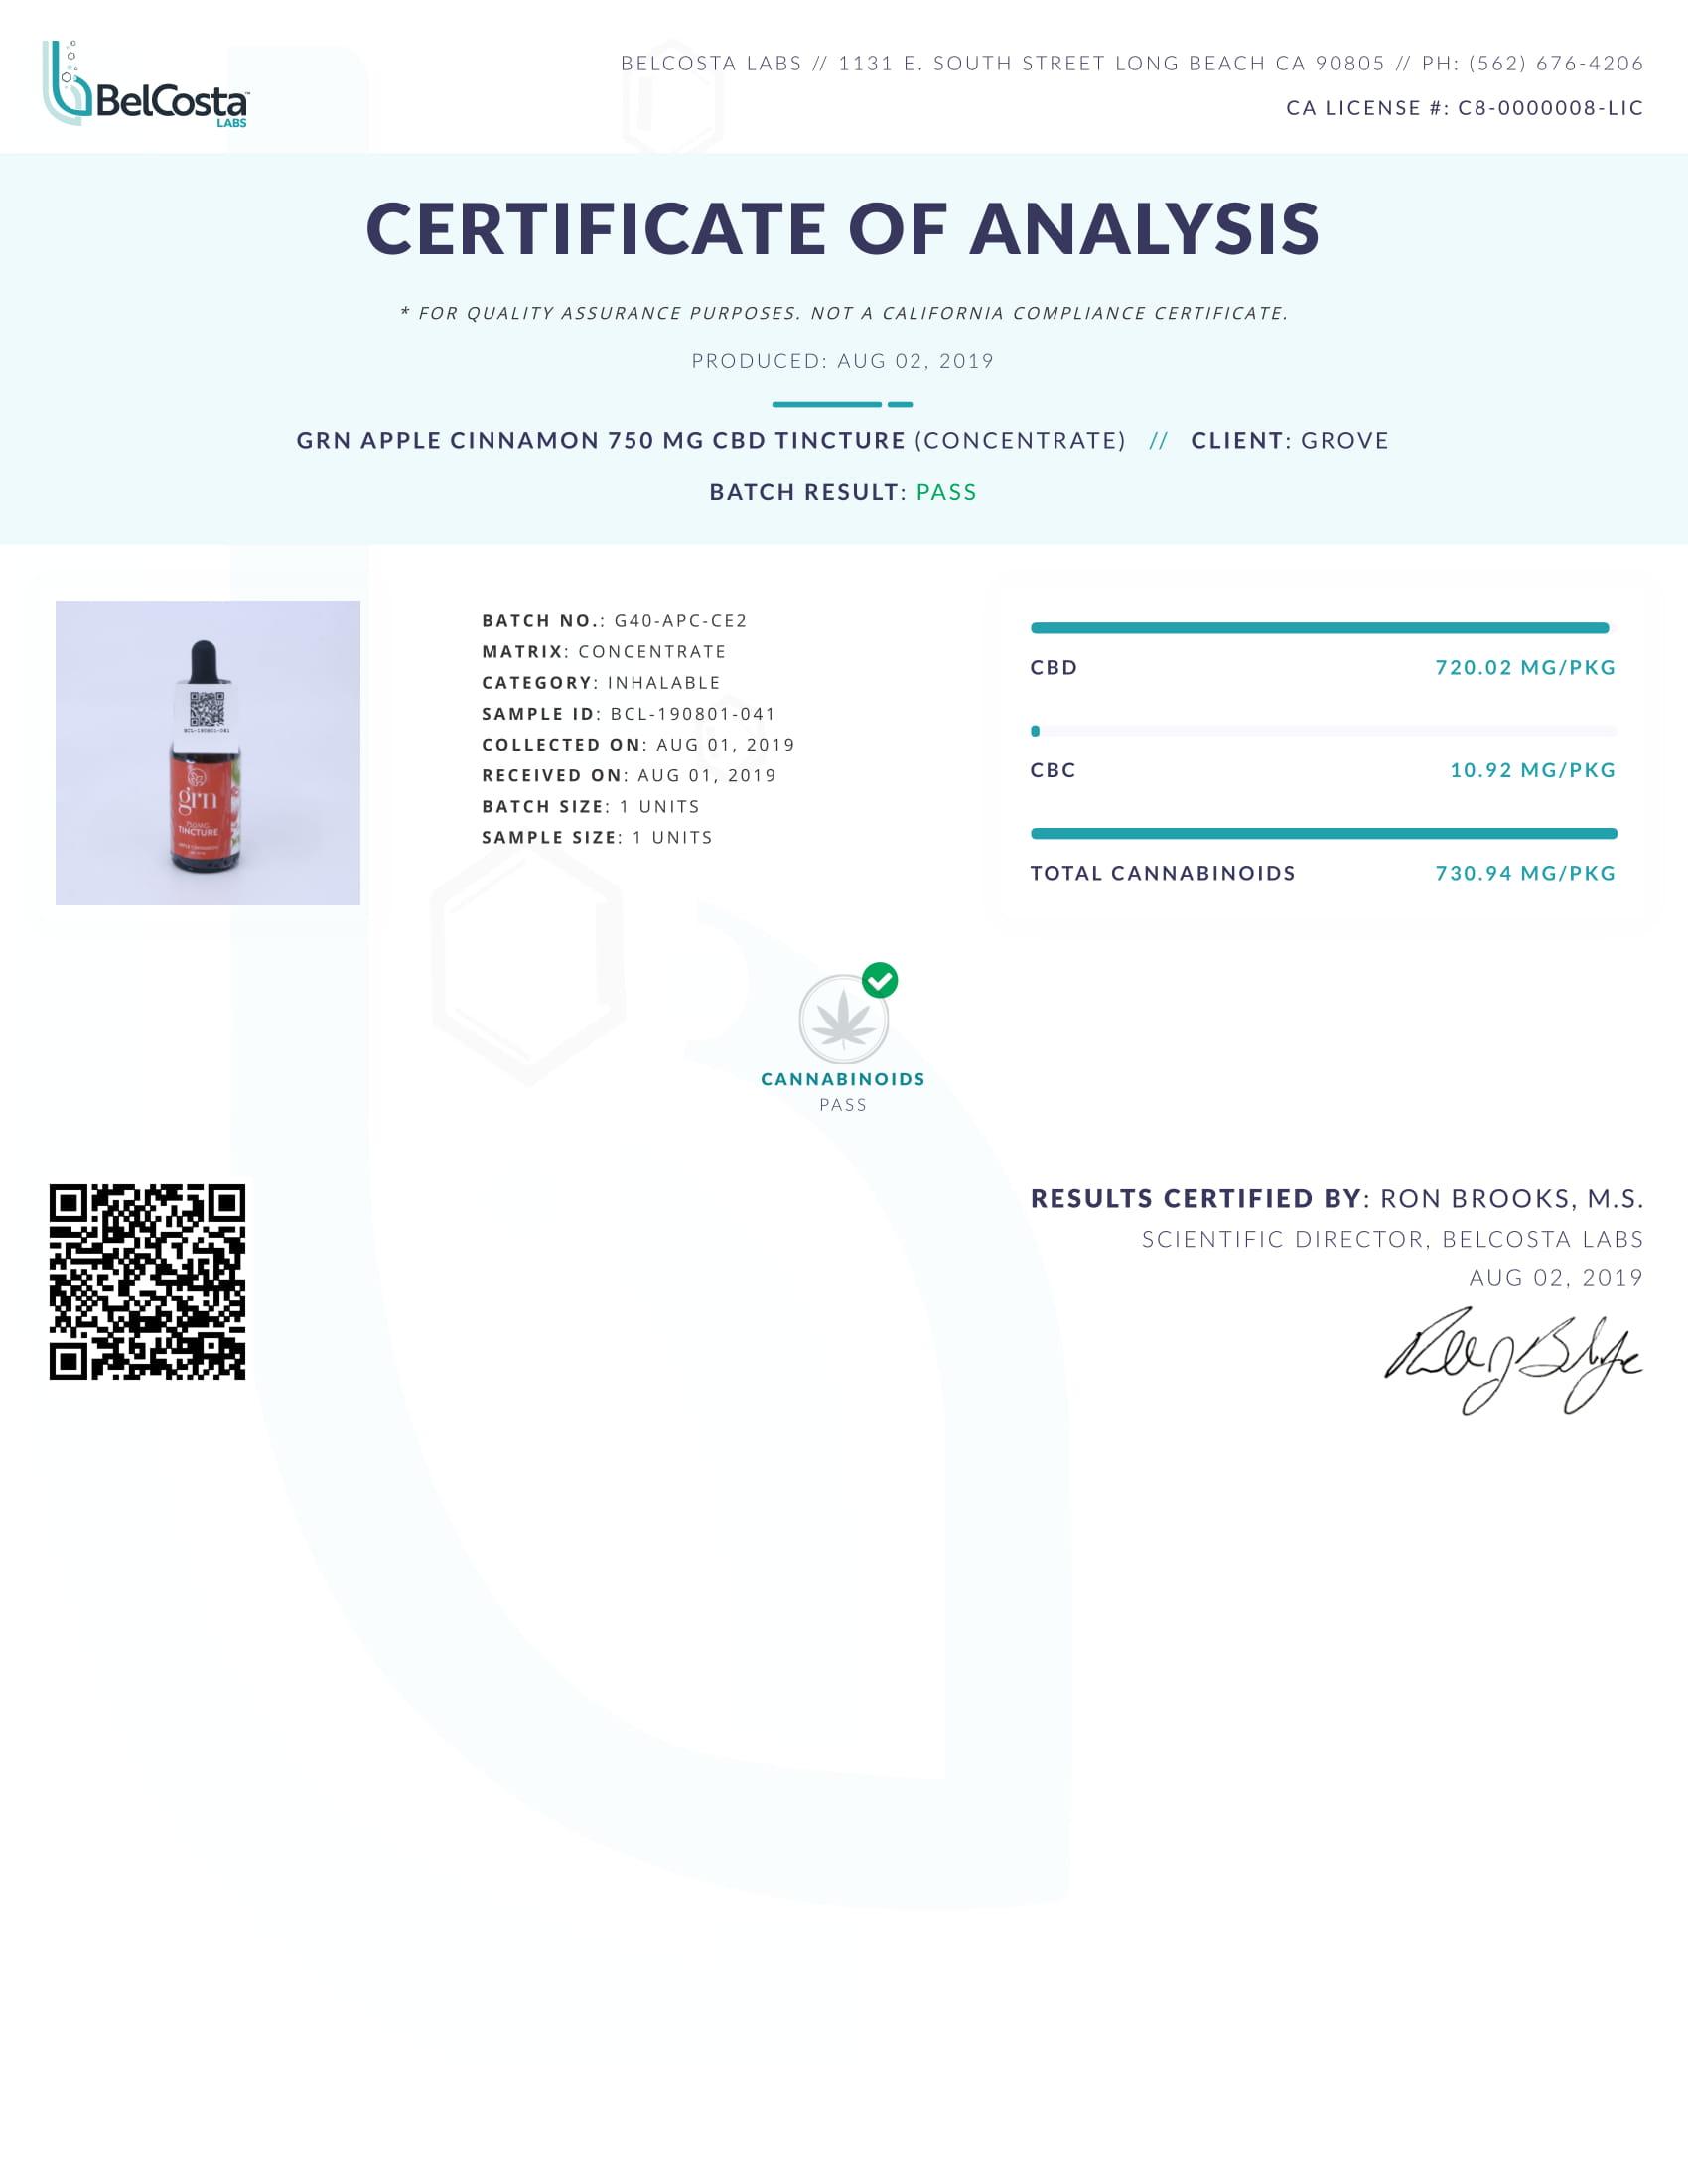 GRN CBD Oil Tincture Apple Cinnamon Lab Report Broad Spectrum 750mg